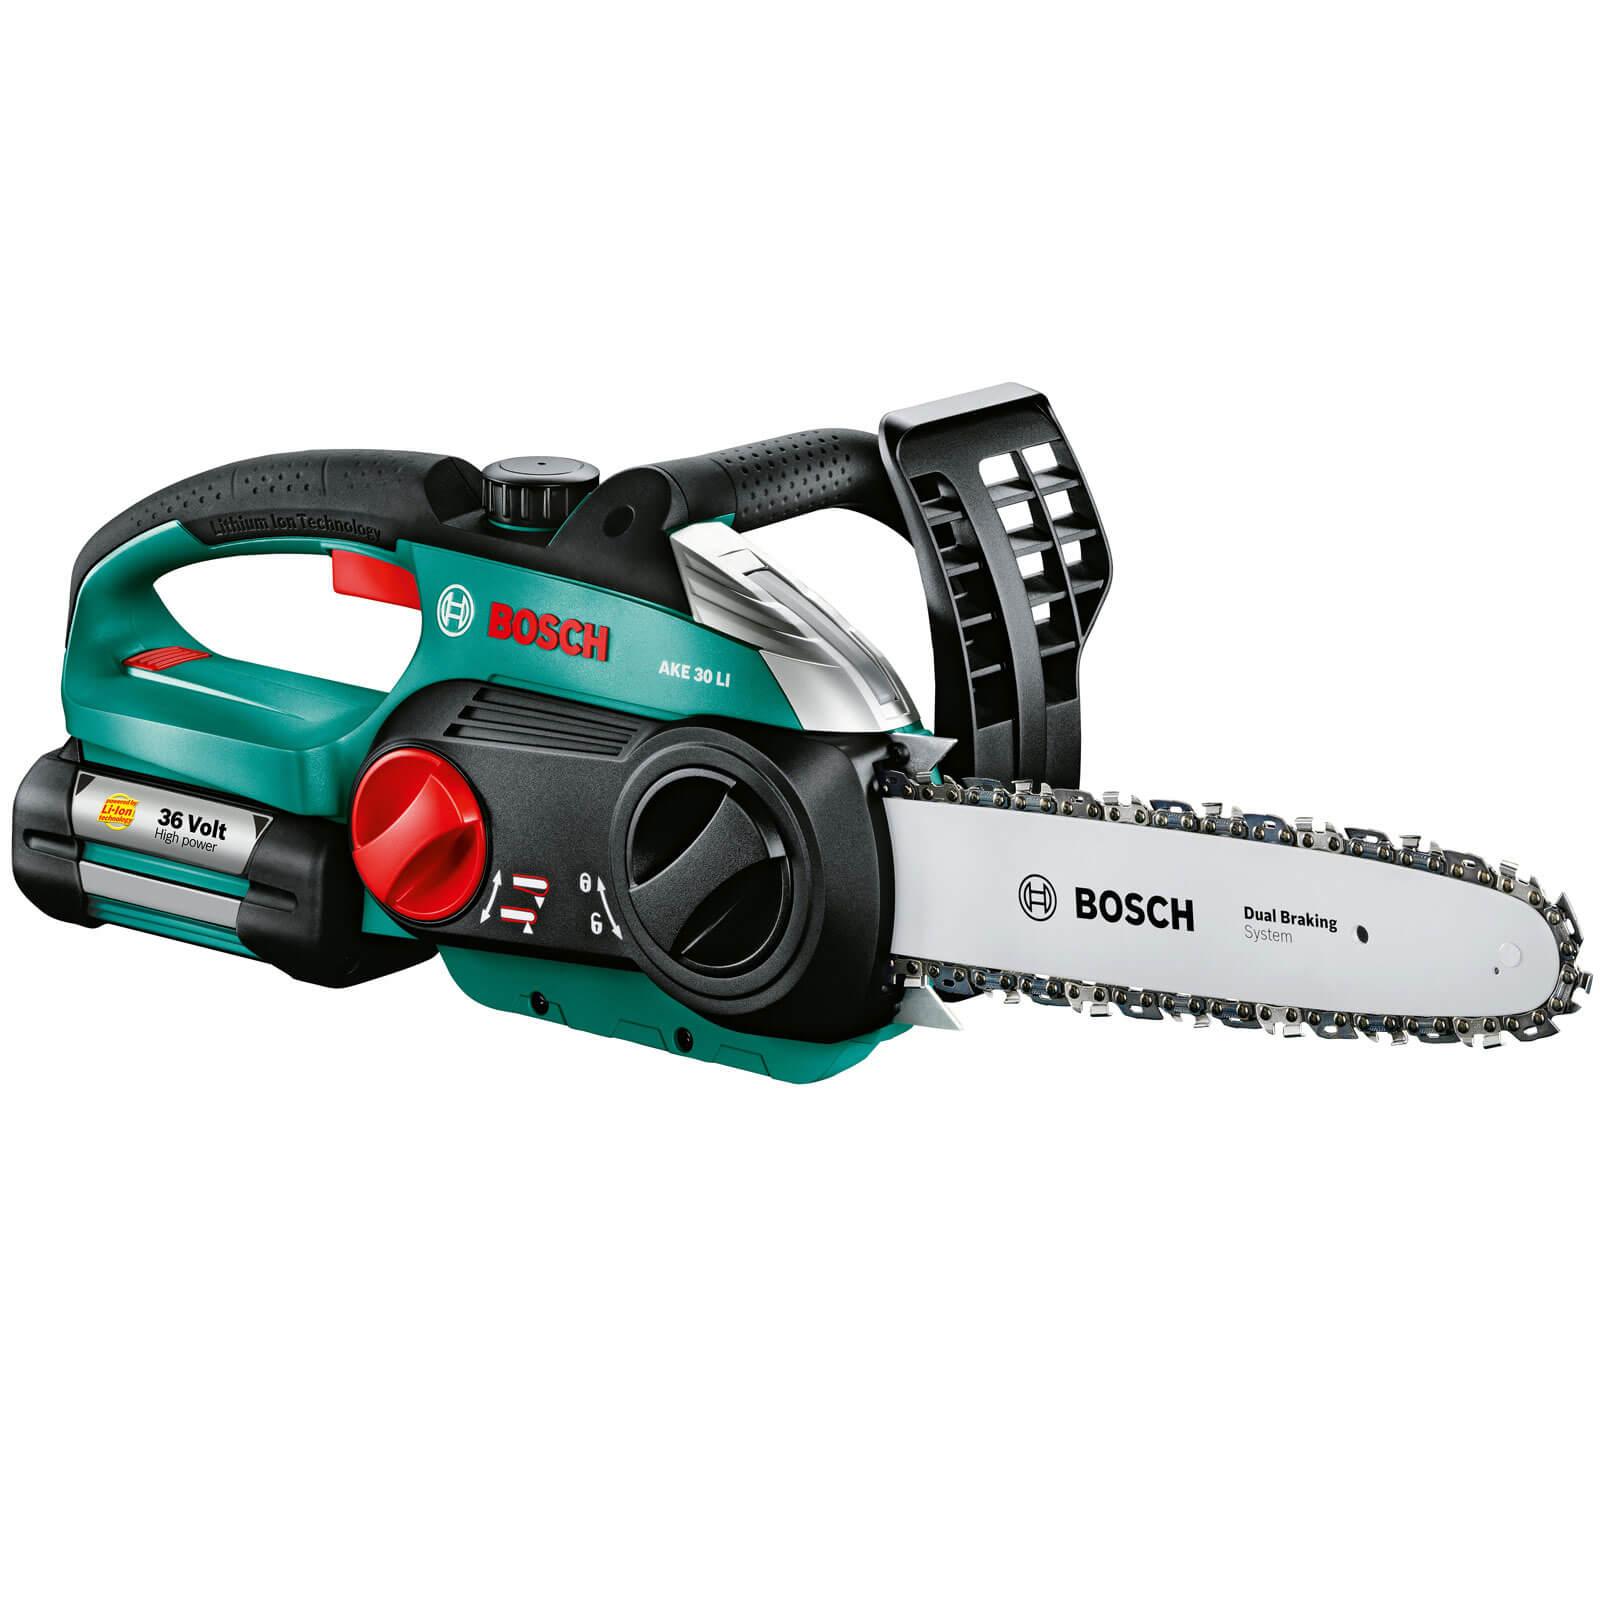 Bosch AKE 30 Li 36v Cordless Chain Saw 300mm Bar Length + 1 Lithium Ion Battery